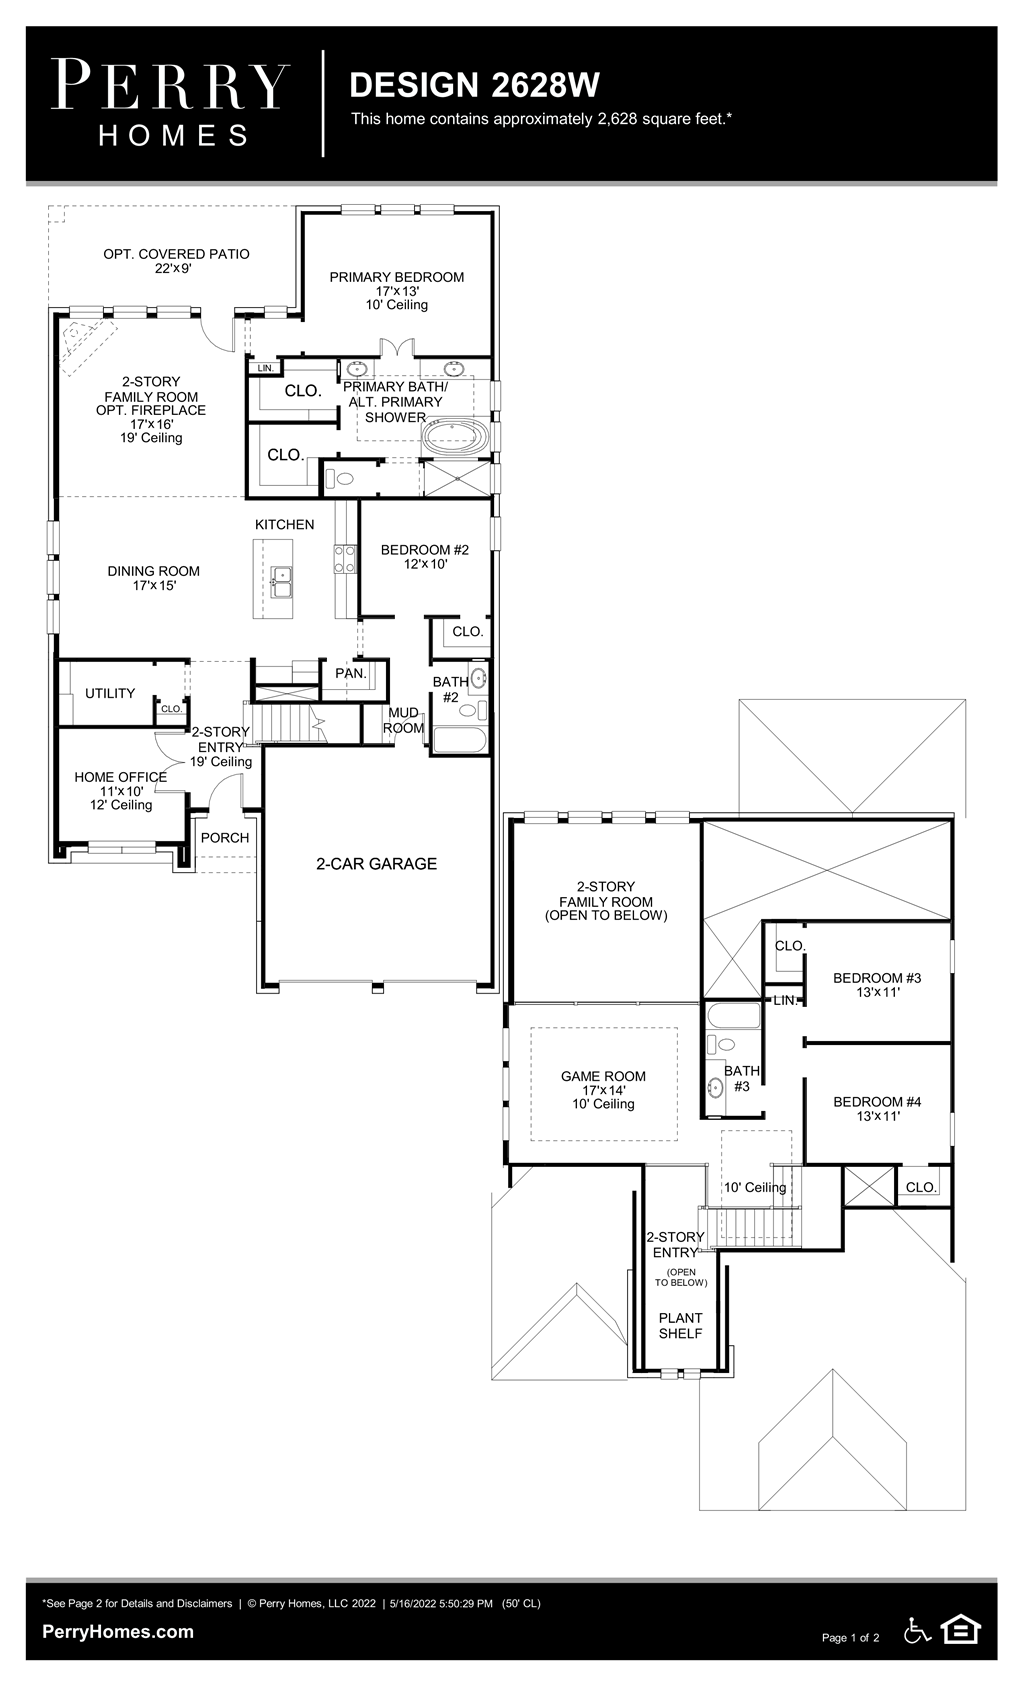 Floor Plan for 2628W